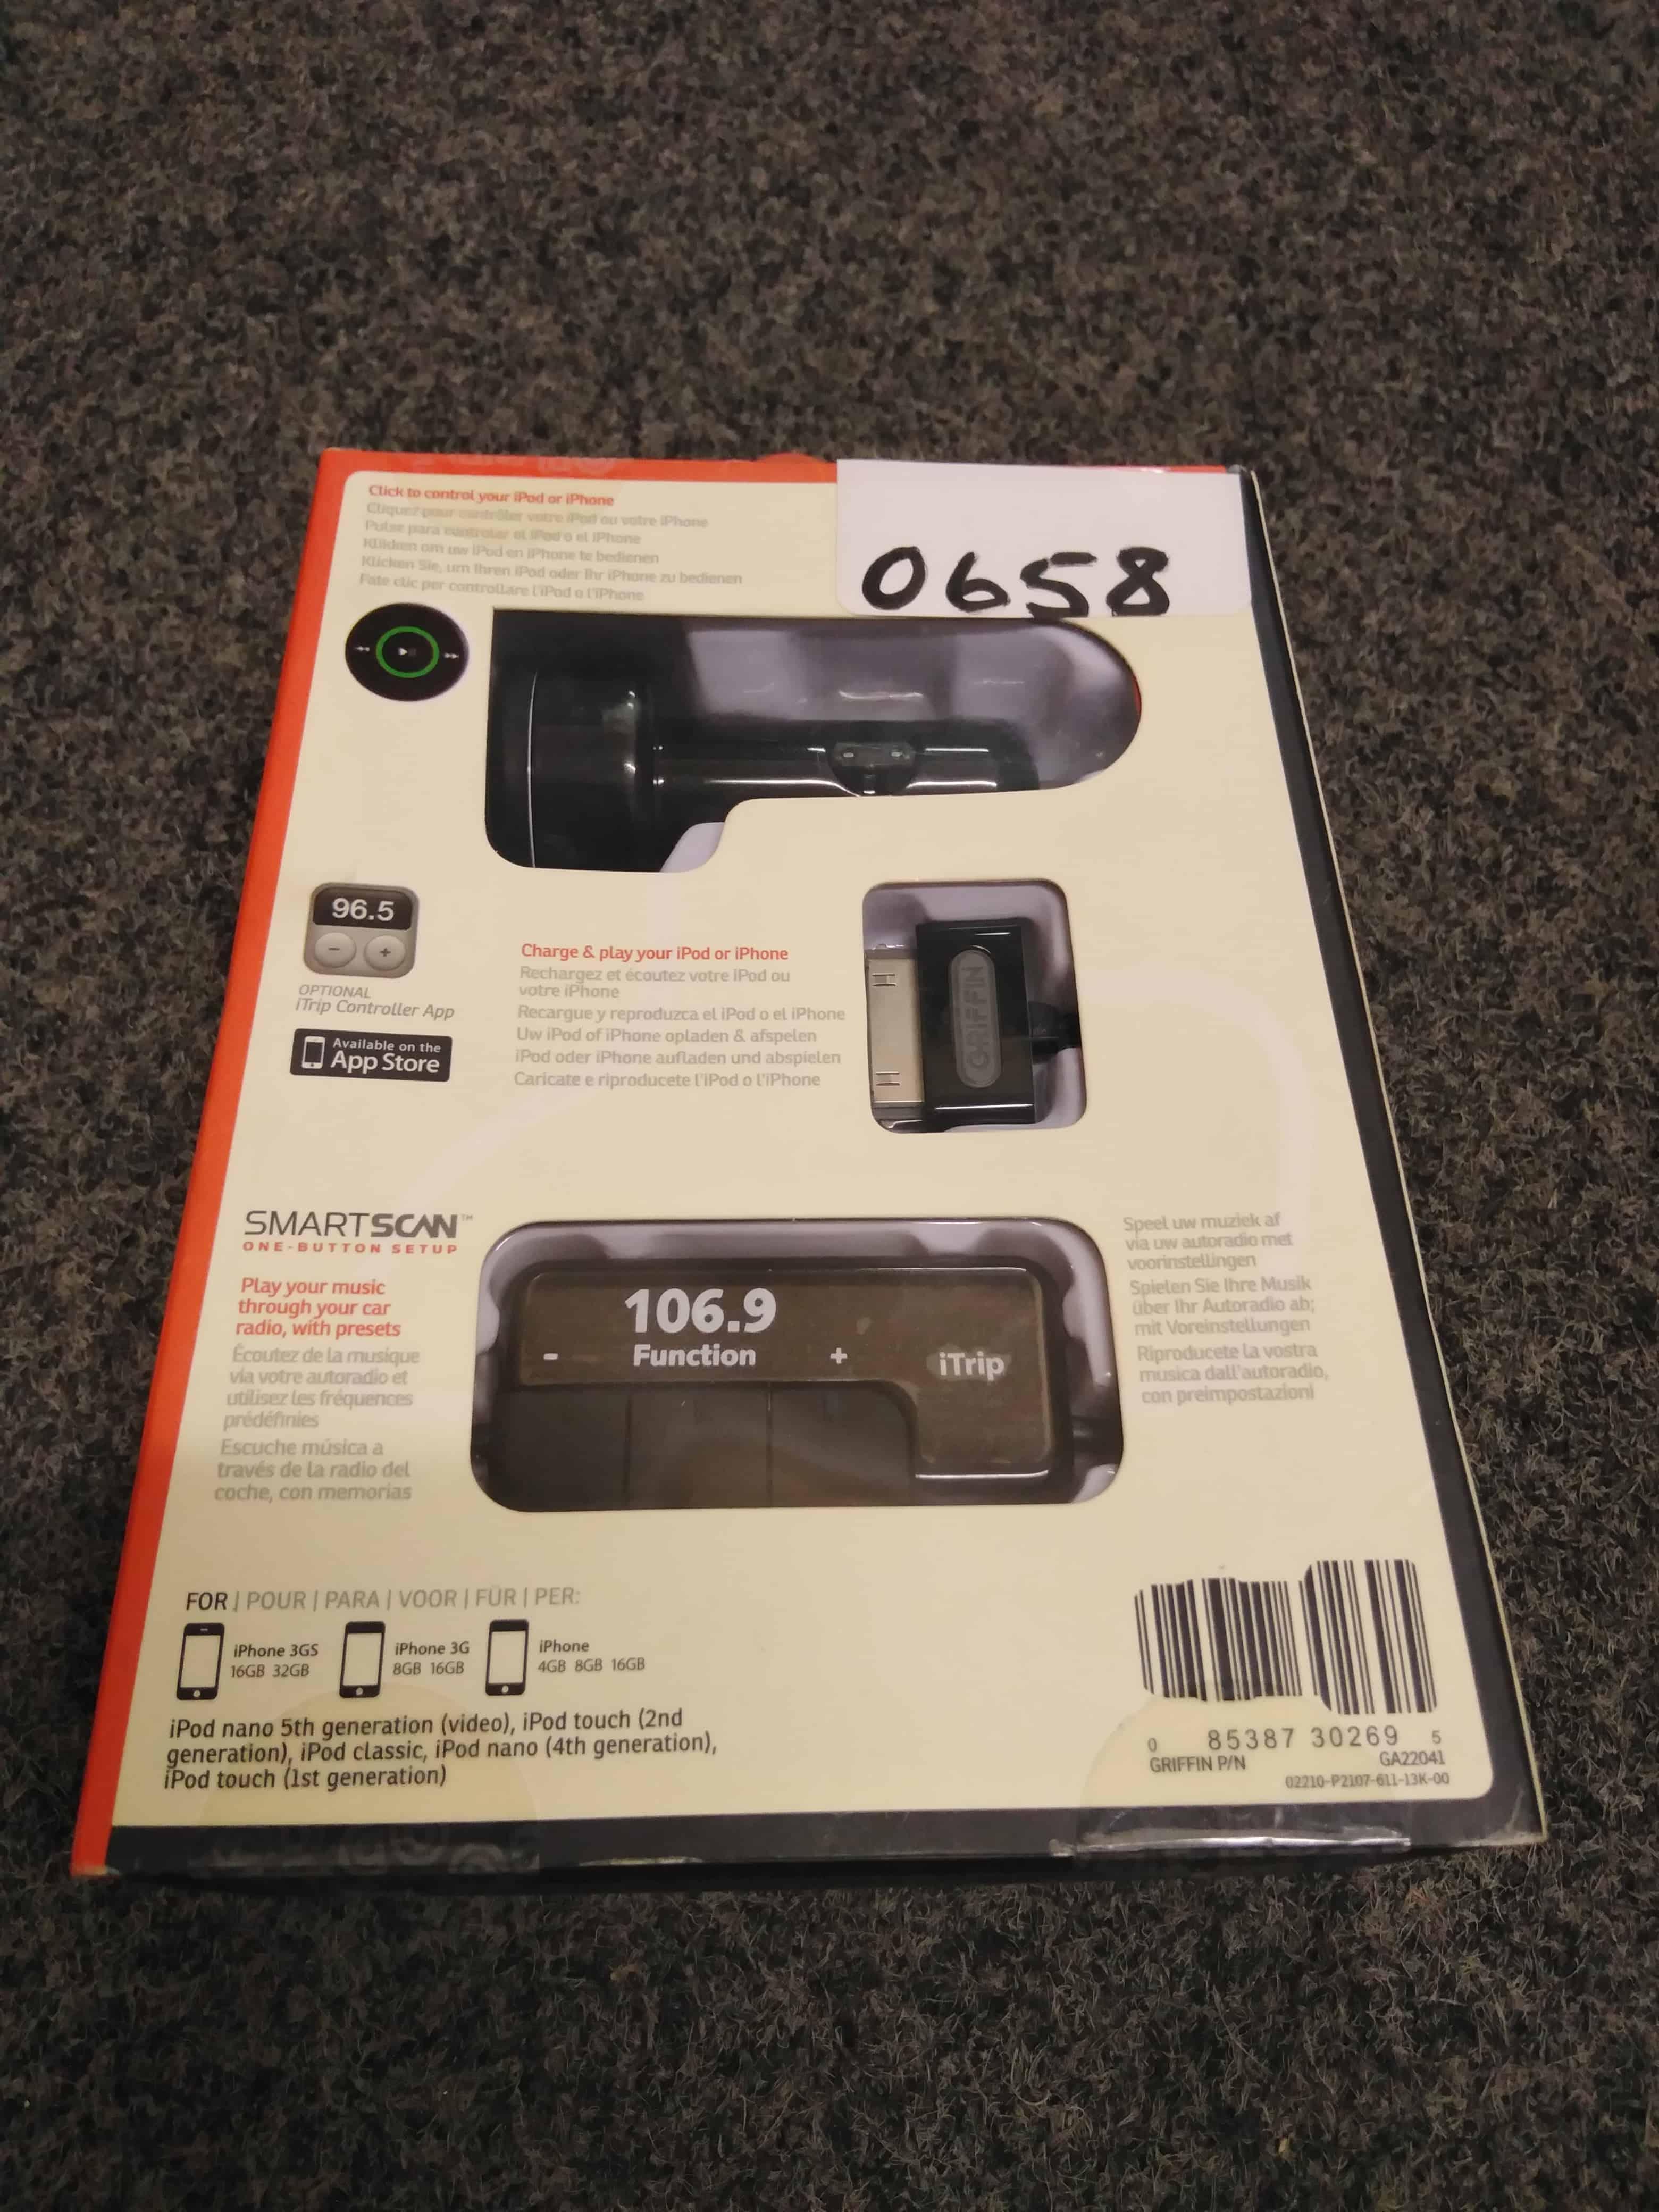 #0658 iTrip AutoPilot (Play on Fm Radio+Charge+Control)